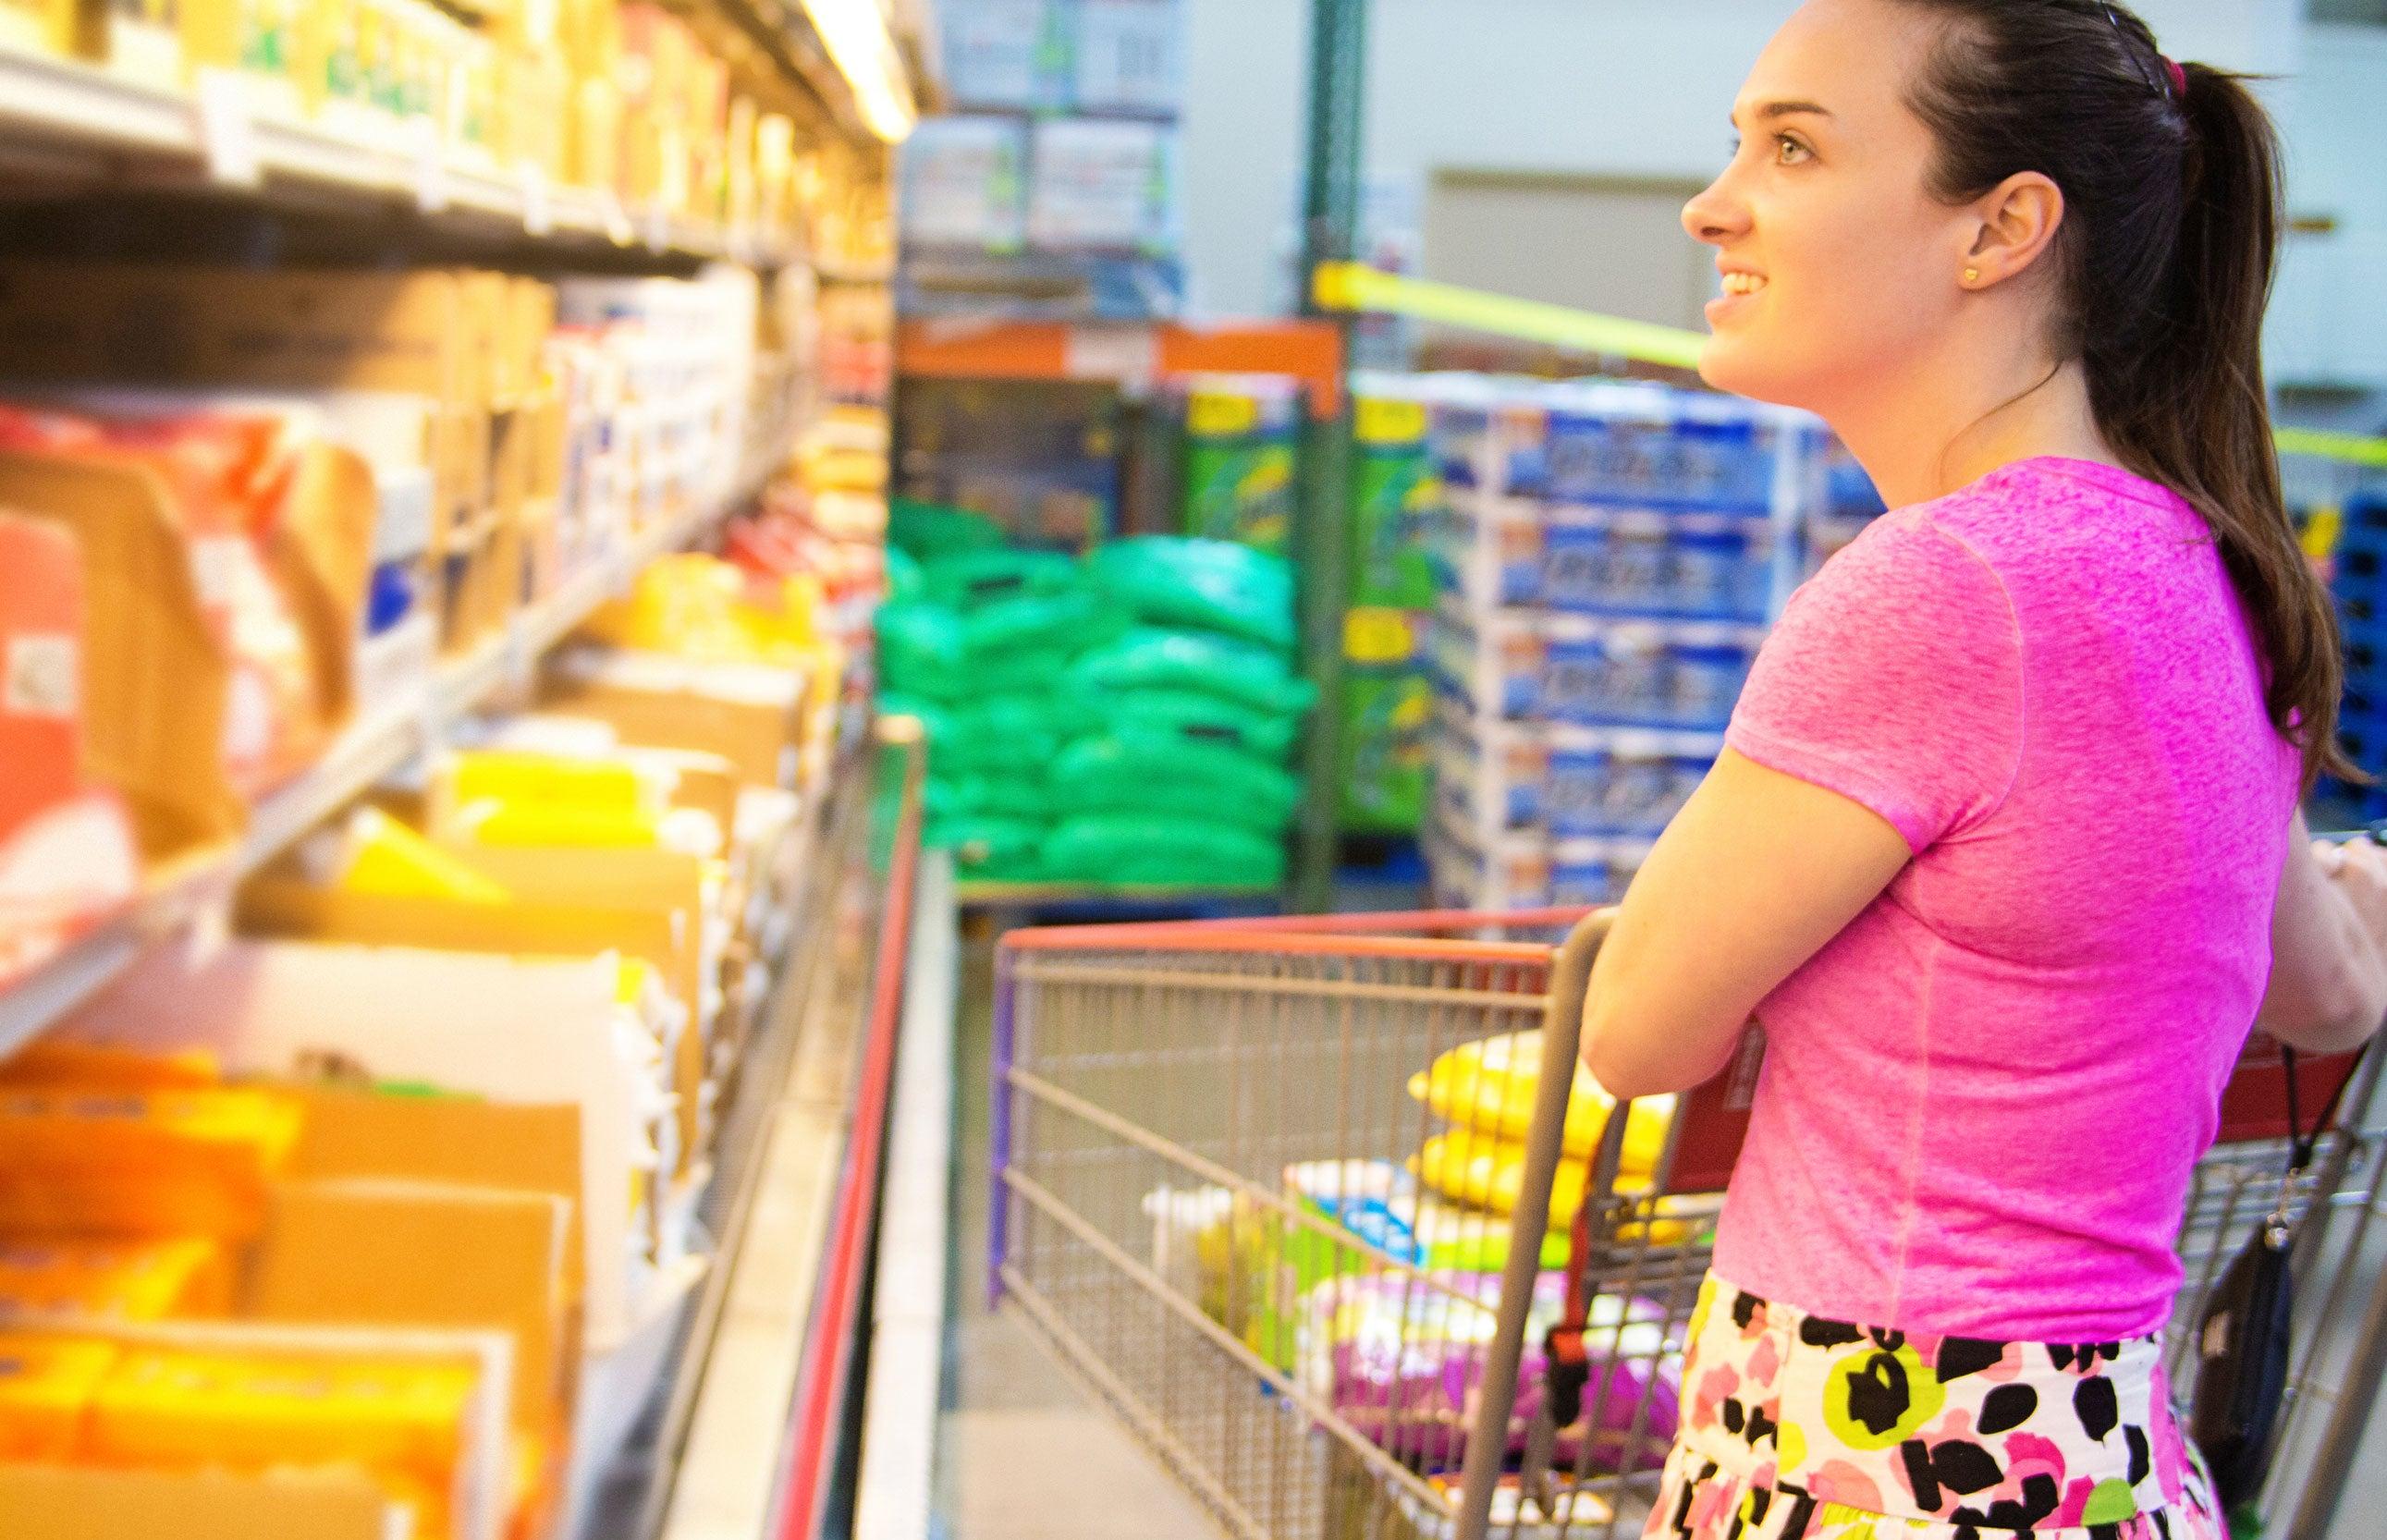 9 Foods to Buy in Bulk if